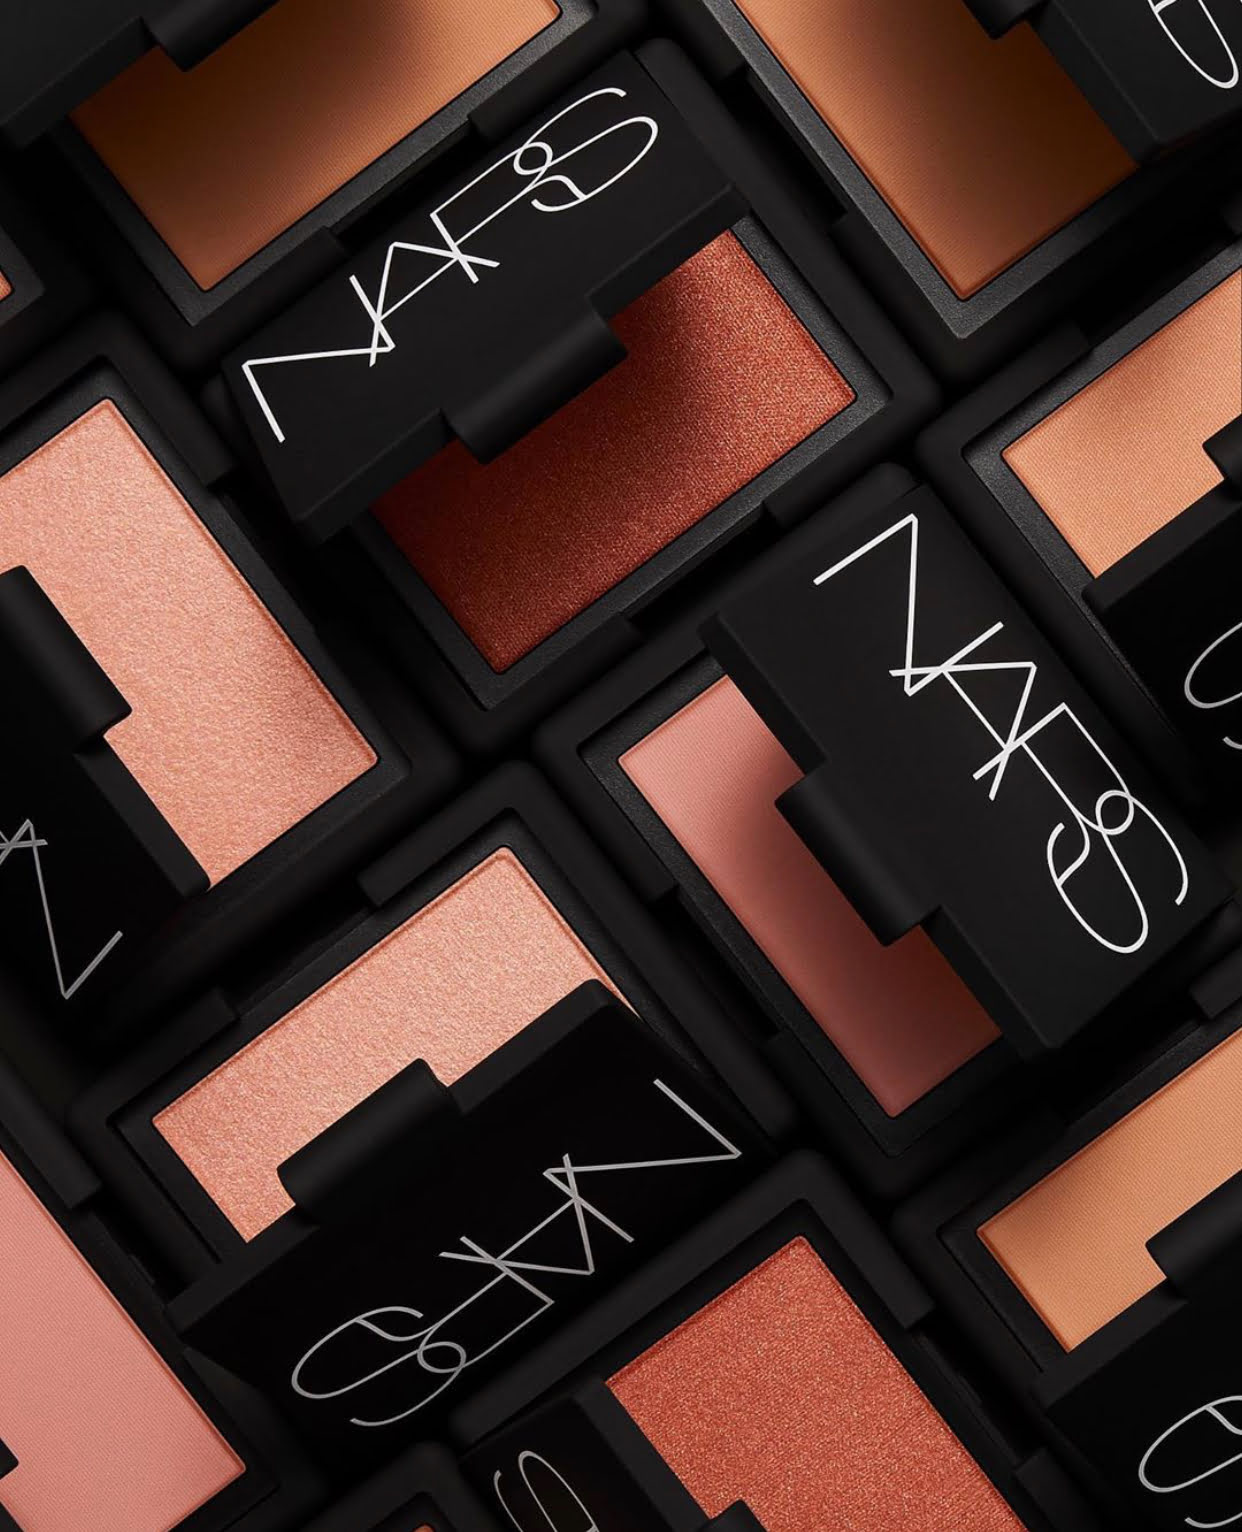 NARS Blush Edit Spring 2020